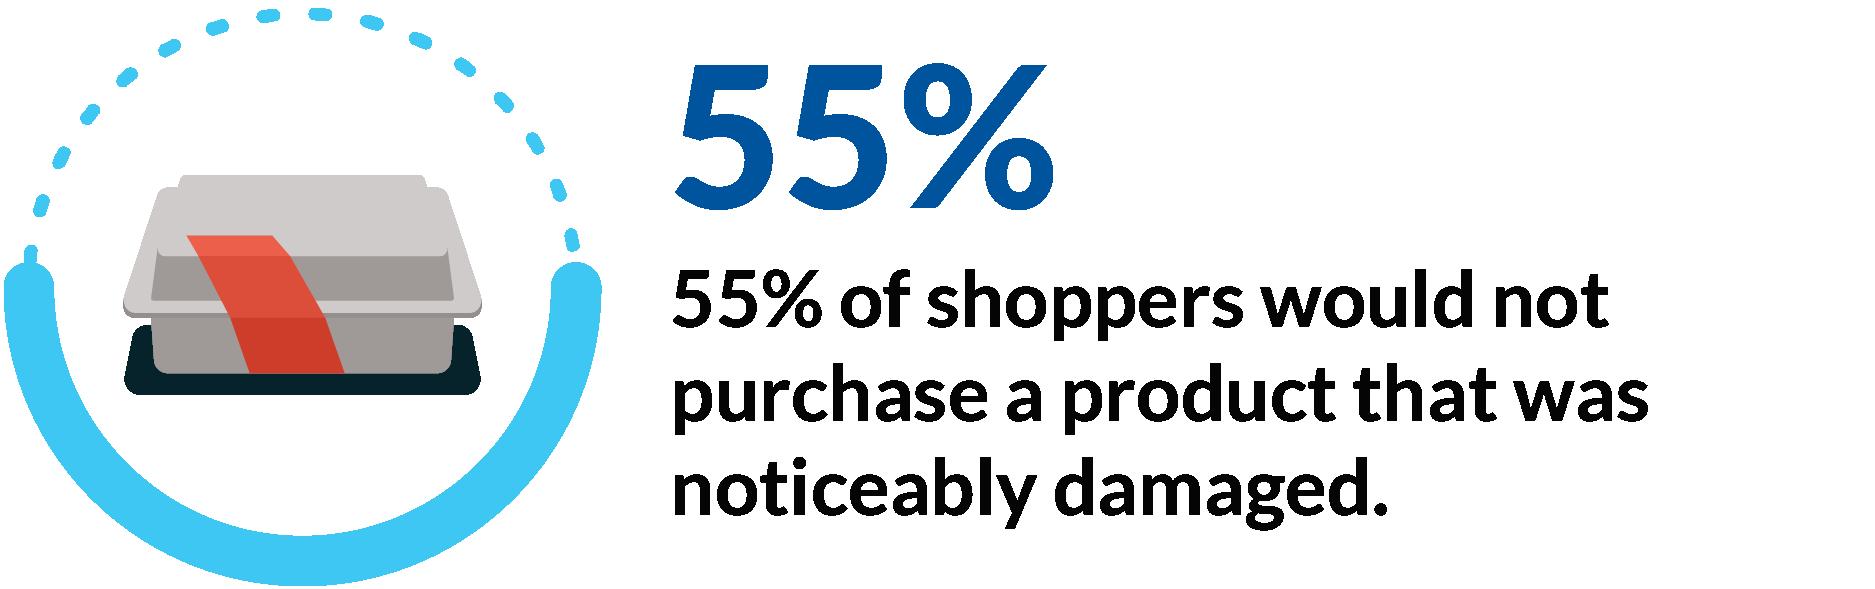 Content_PercentageOfPeopleNotPurchasingDamagedProduct